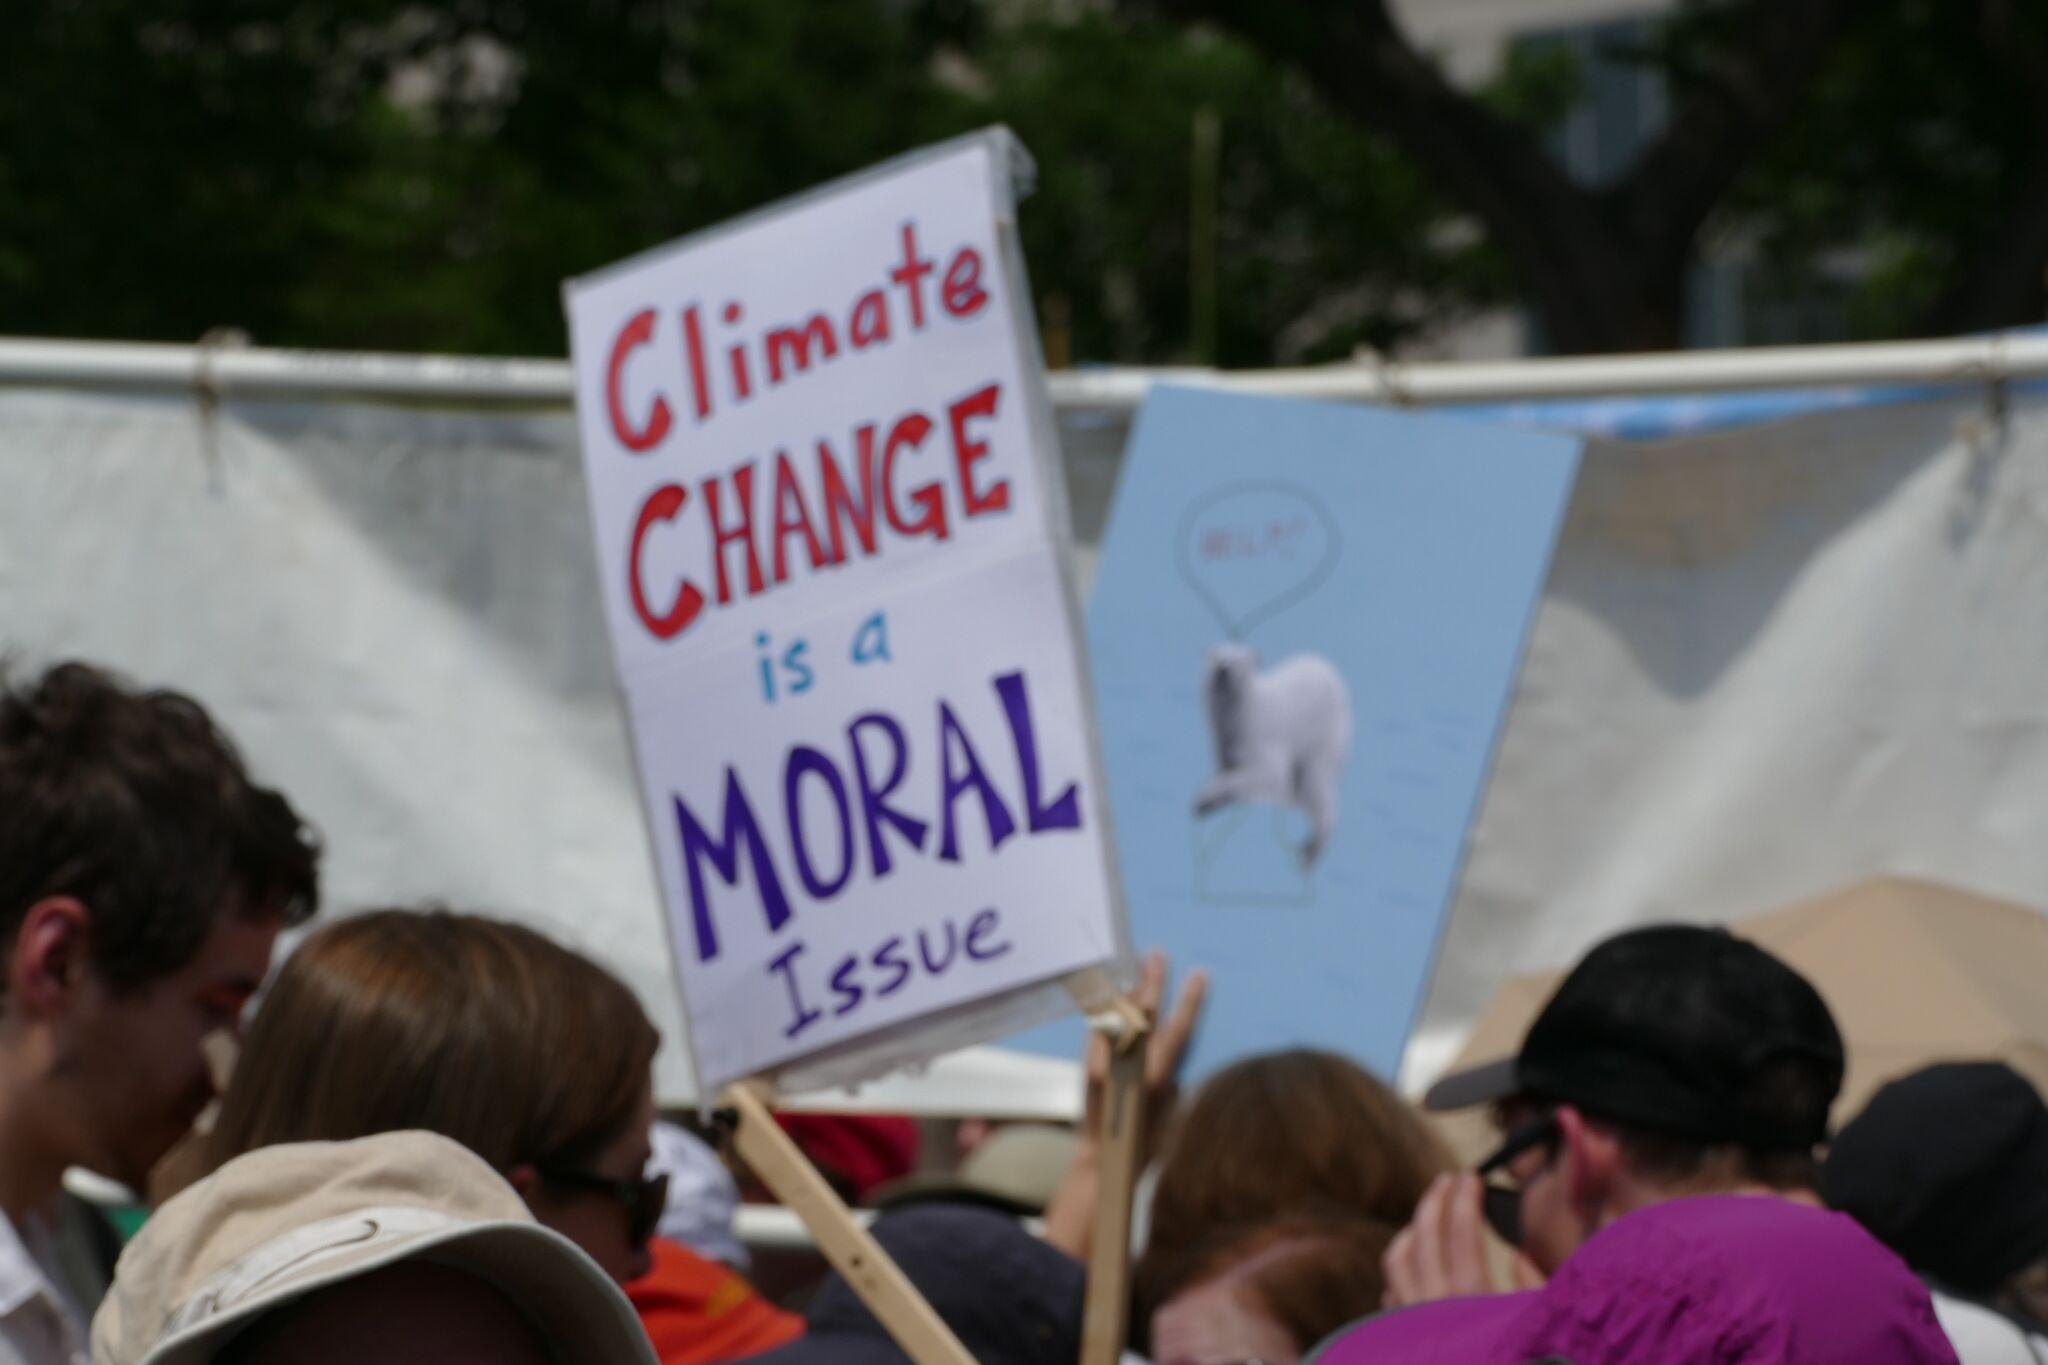 ClimateMoralIssue.JPG